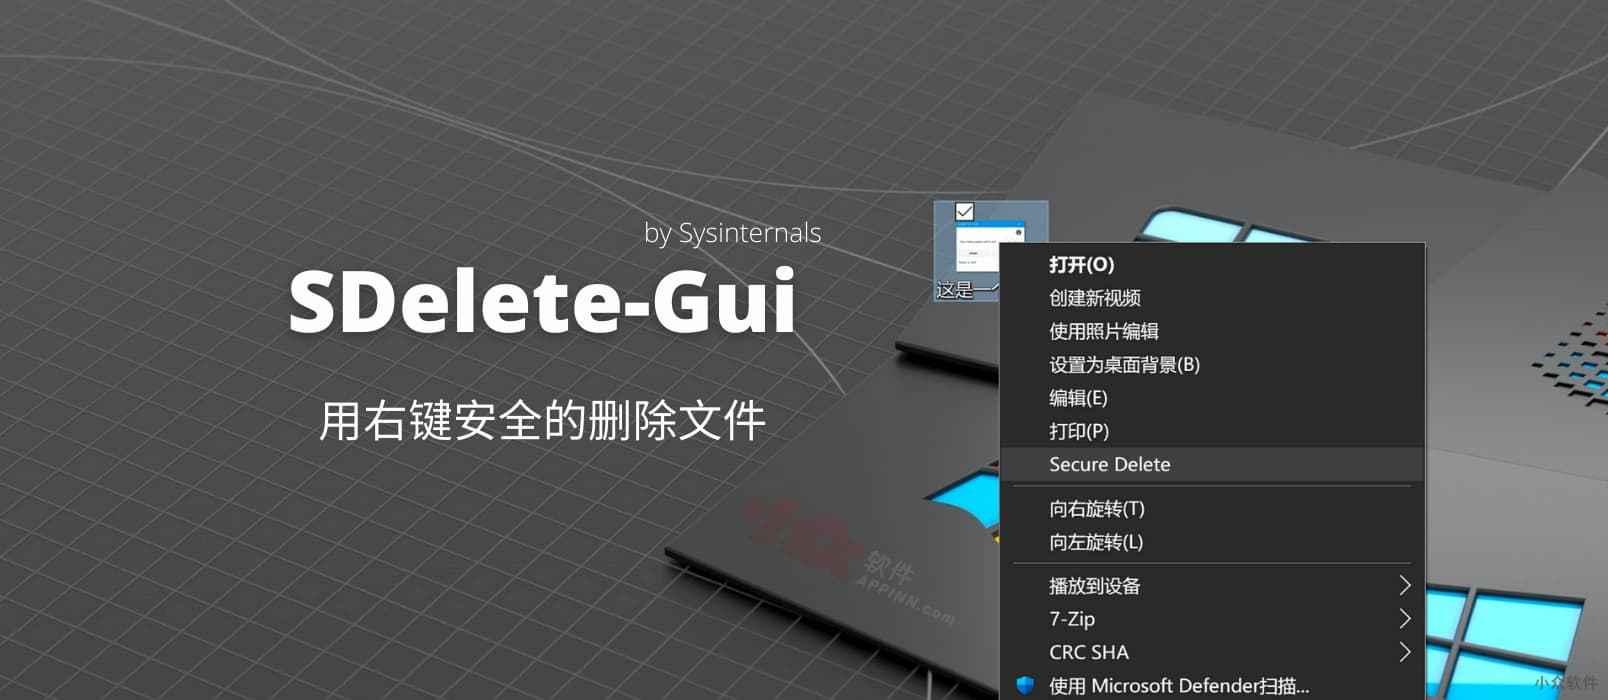 SDelete-Gui – 用右键安全的删除文件,不可恢复[Windows]